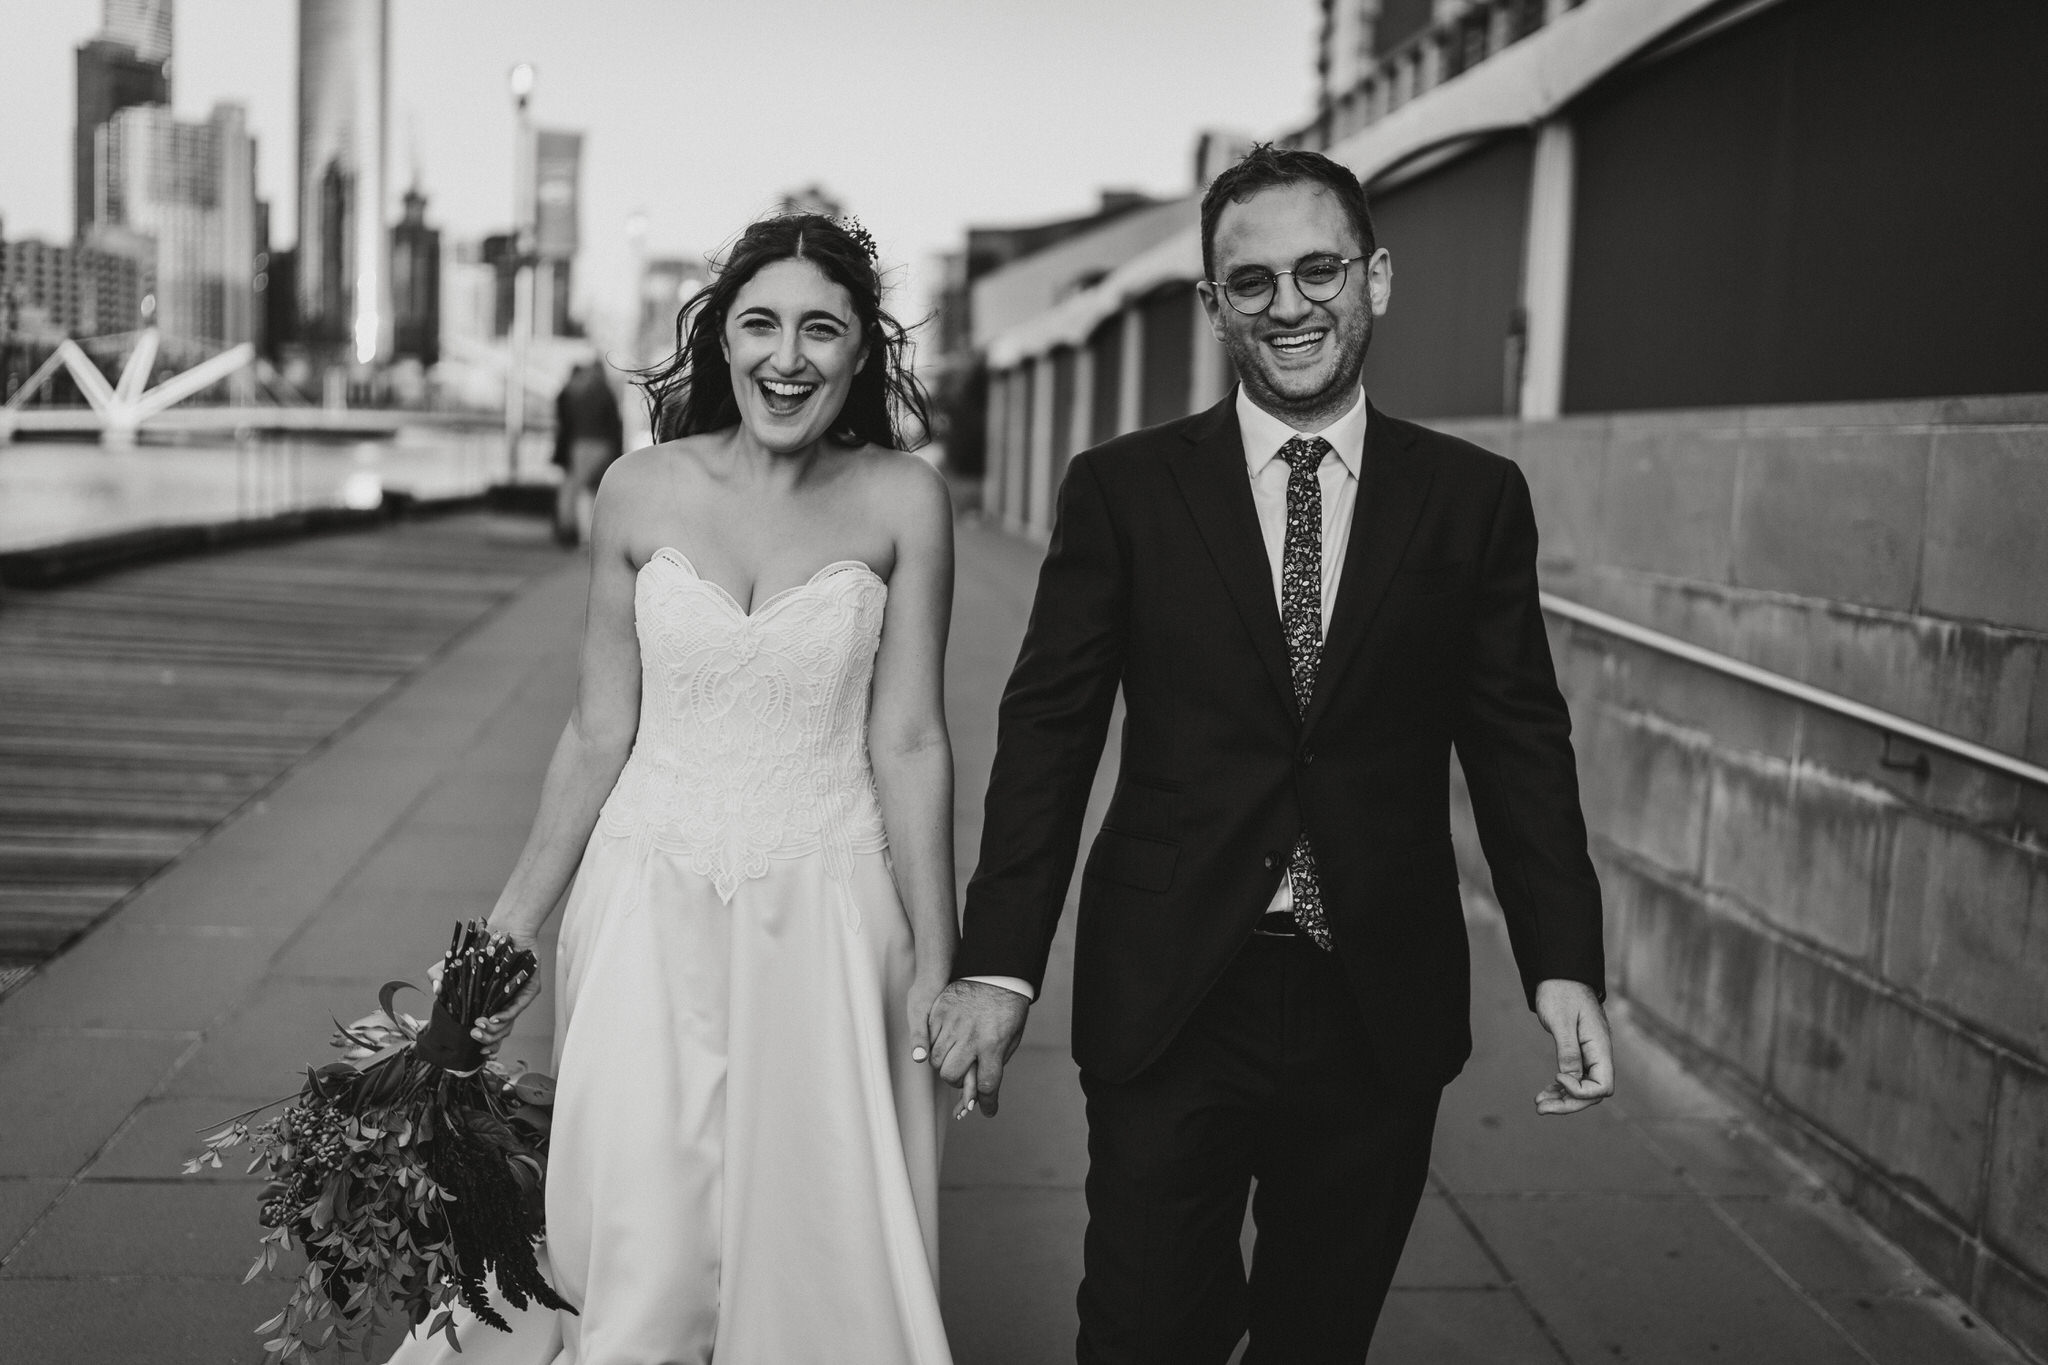 Ellie & Elliot_Wedding Day_Web Res_761.jpg